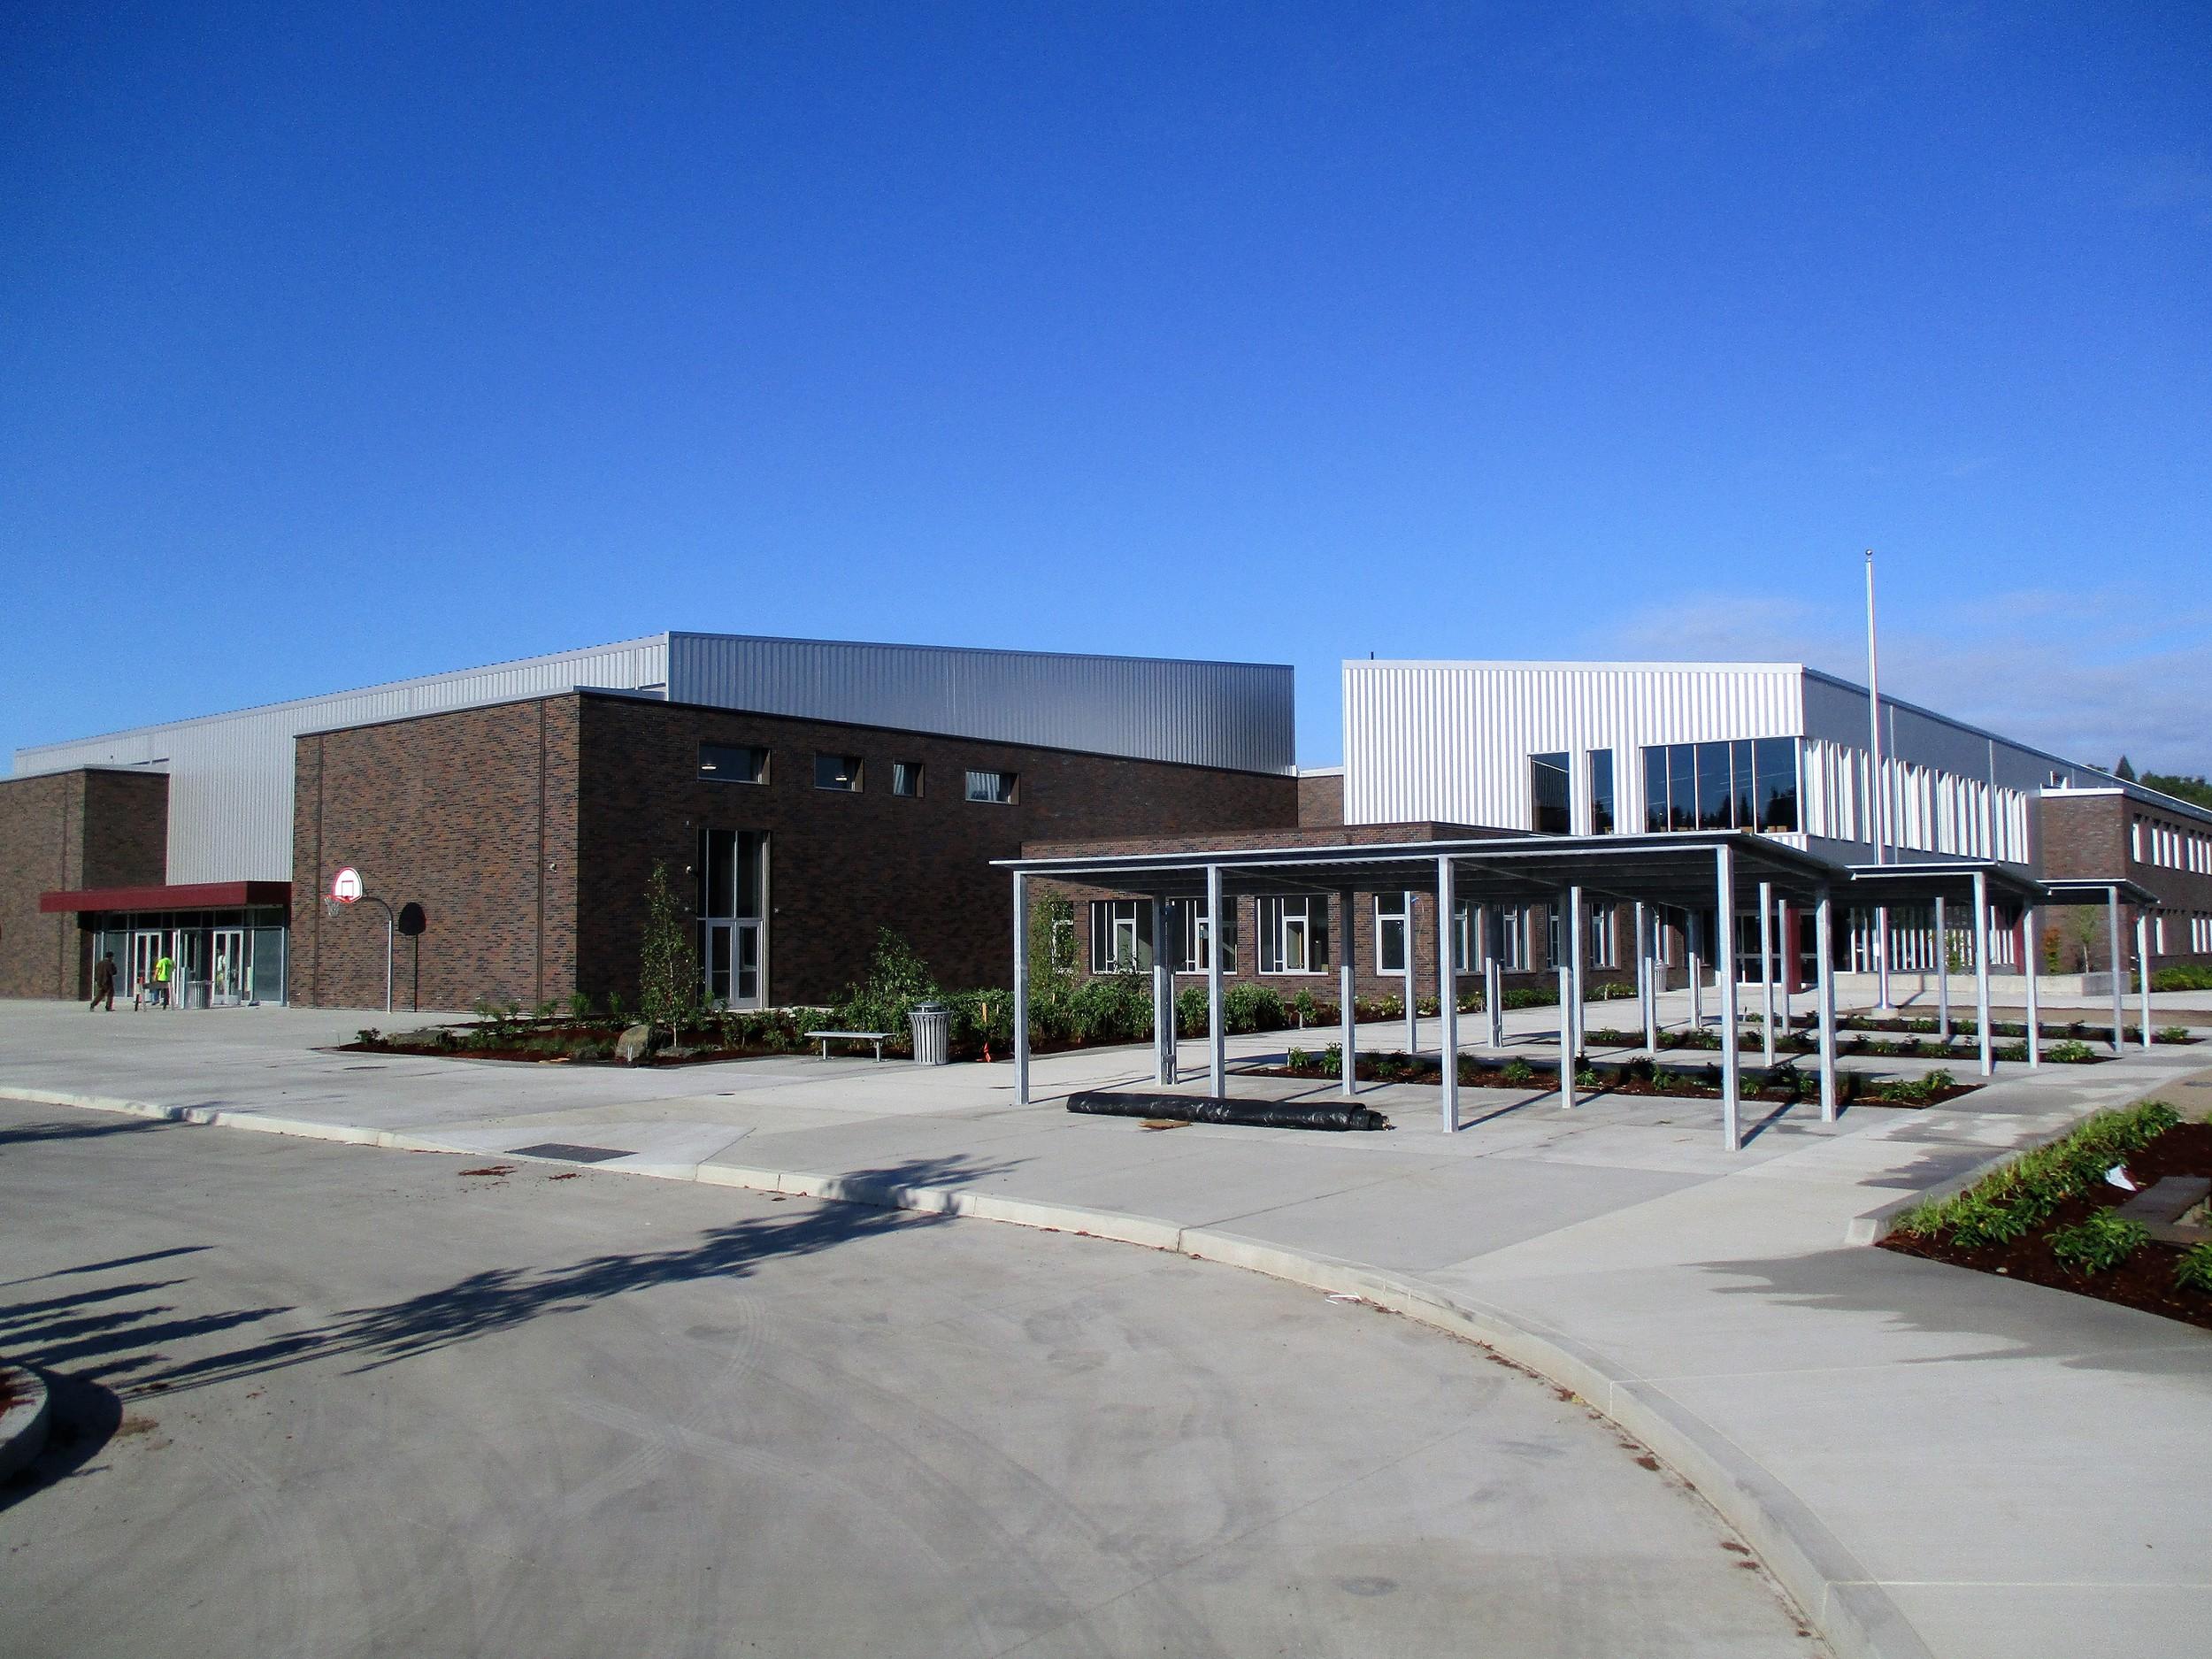 2141017 - Roosevelt Middle School (6-20-16) (4).JPG